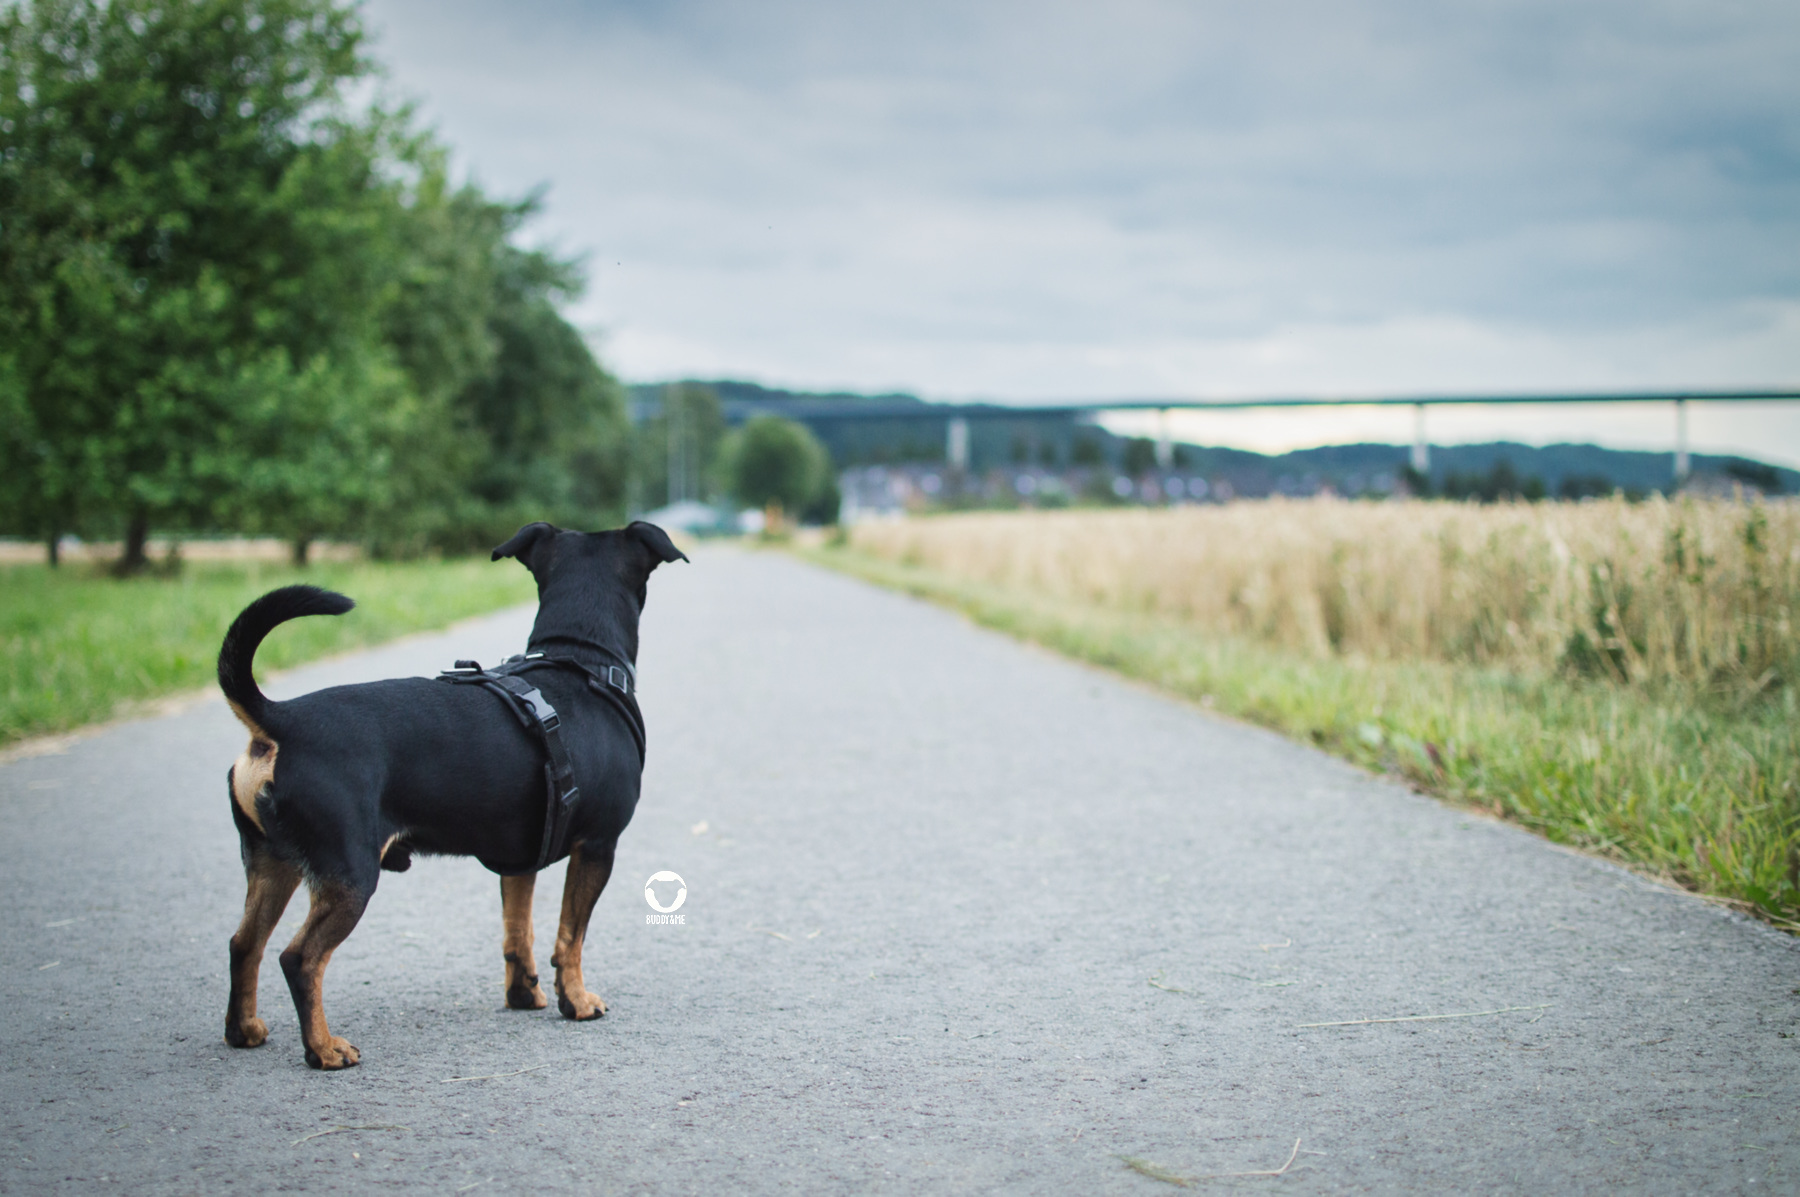 Pinscher Buddy, Buddy and Me, Hundeblog, Dogblog, Ruhrgebiet, Essen, kleine Hunde, Natur, Felder, Sommer, Juli, Spazieren, Gassi, Hundealltag